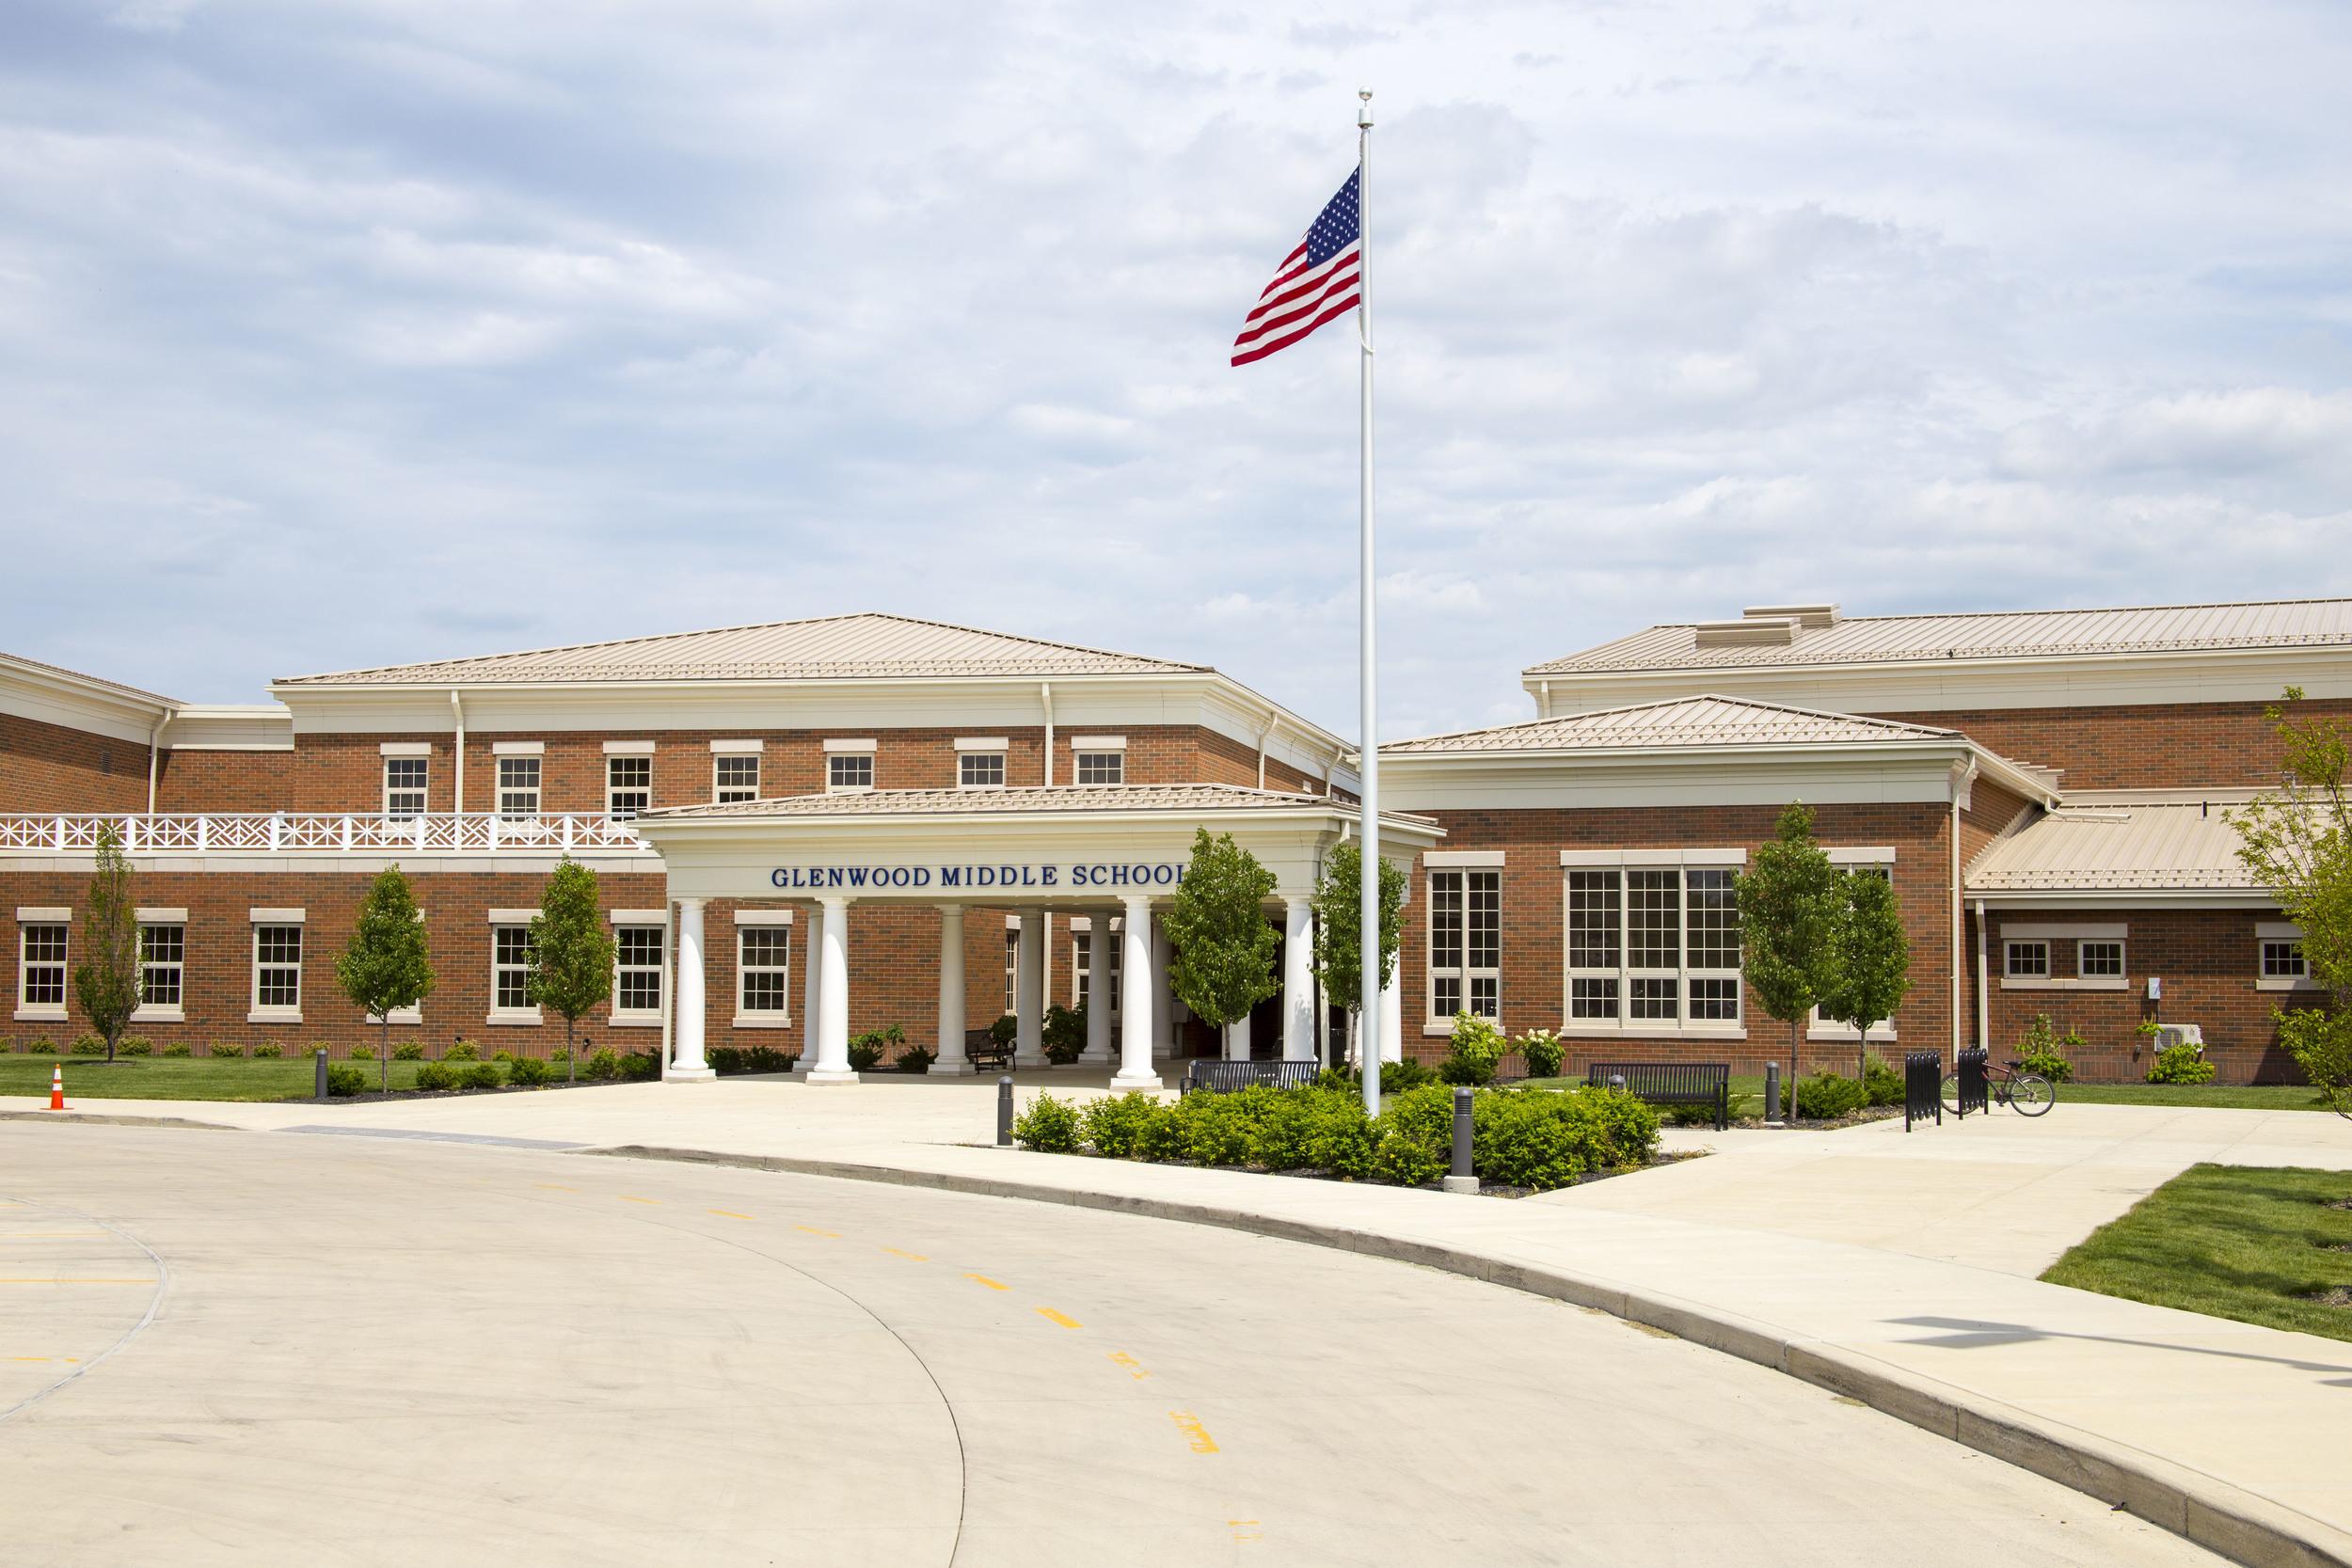 www.rcmarchitects.com - findlay city schools - glenwood middle school (1)